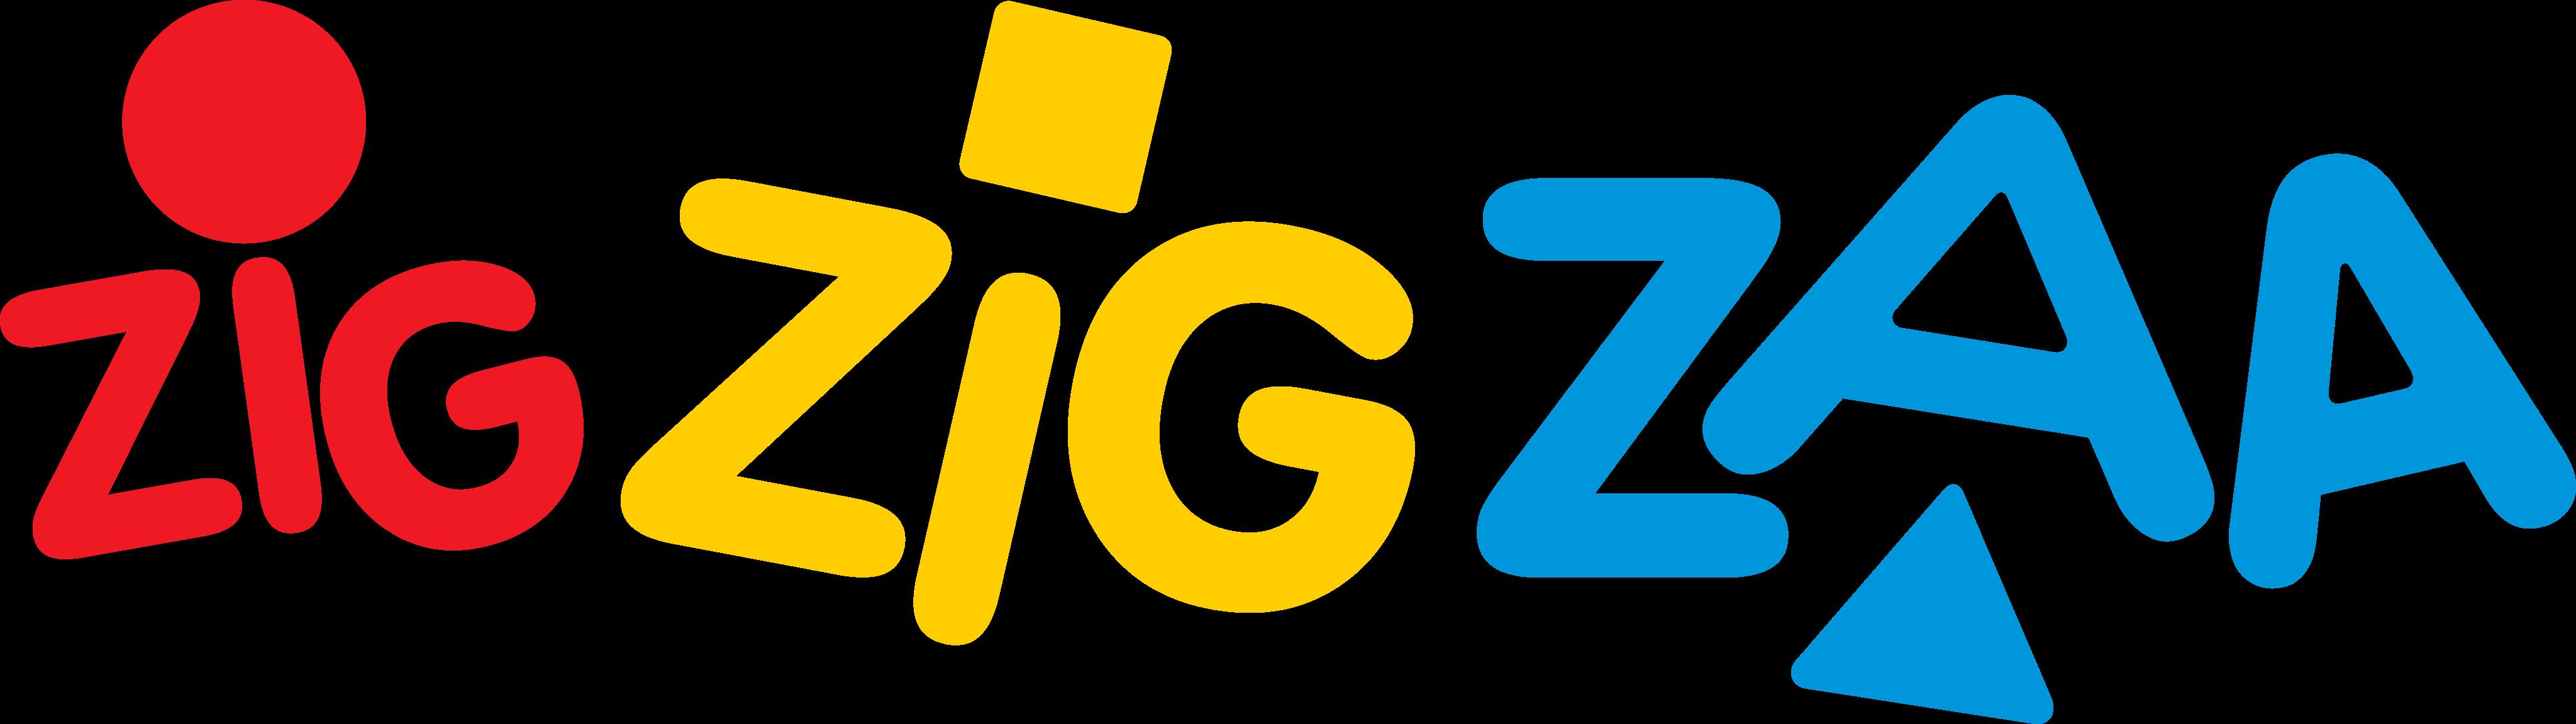 Zig Zig Zaa Logo.